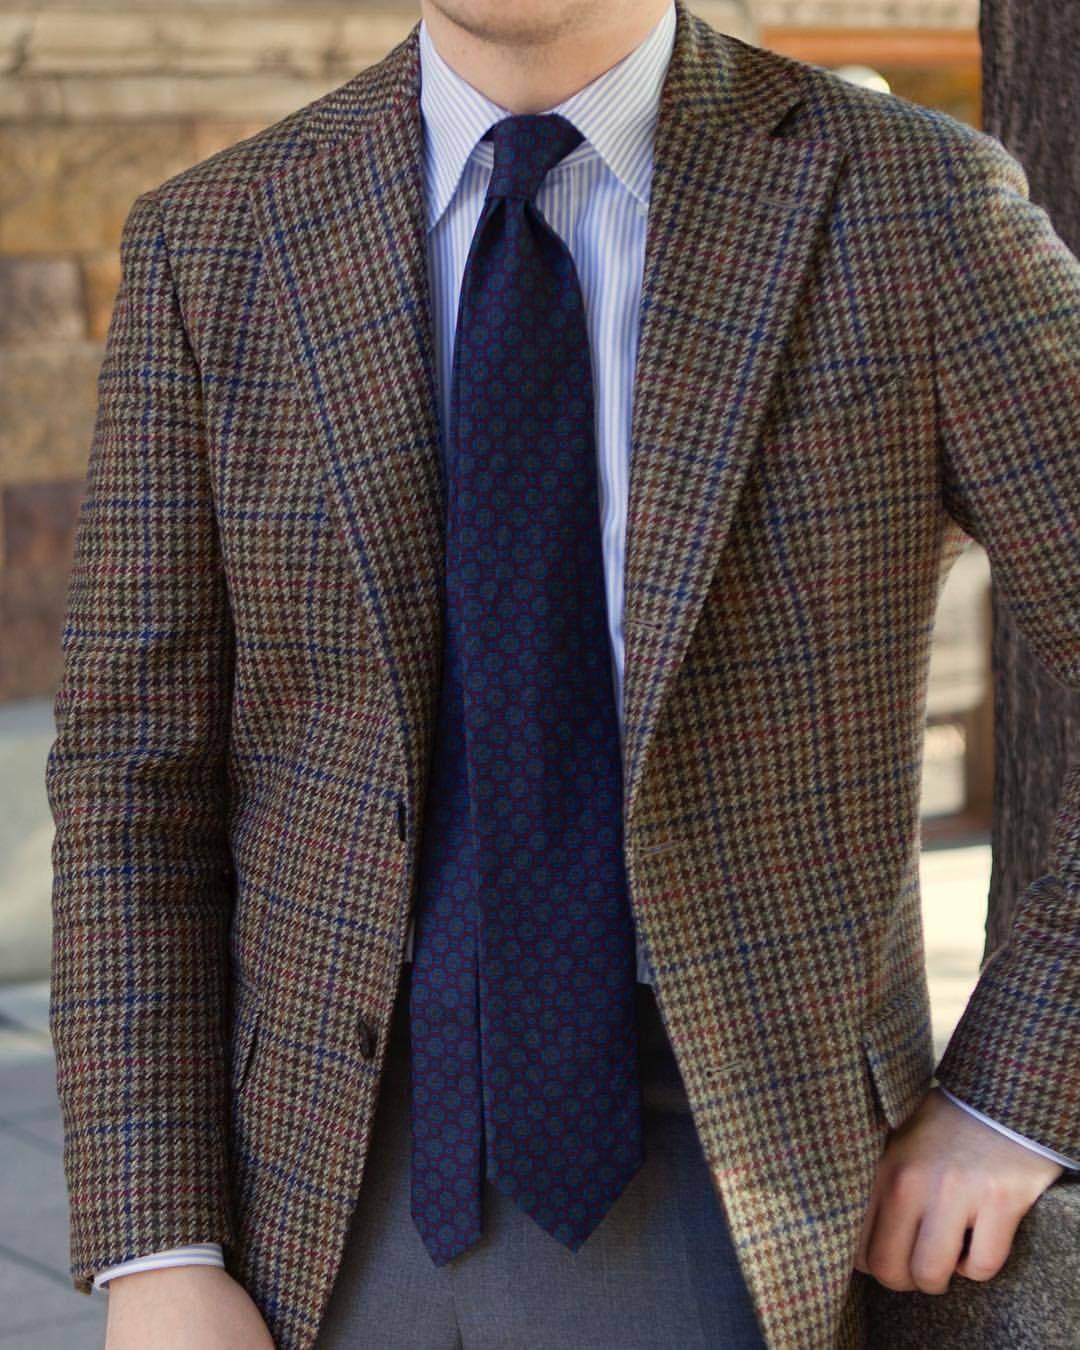 Brown herringbone tweed sport coat, white shirt with blue